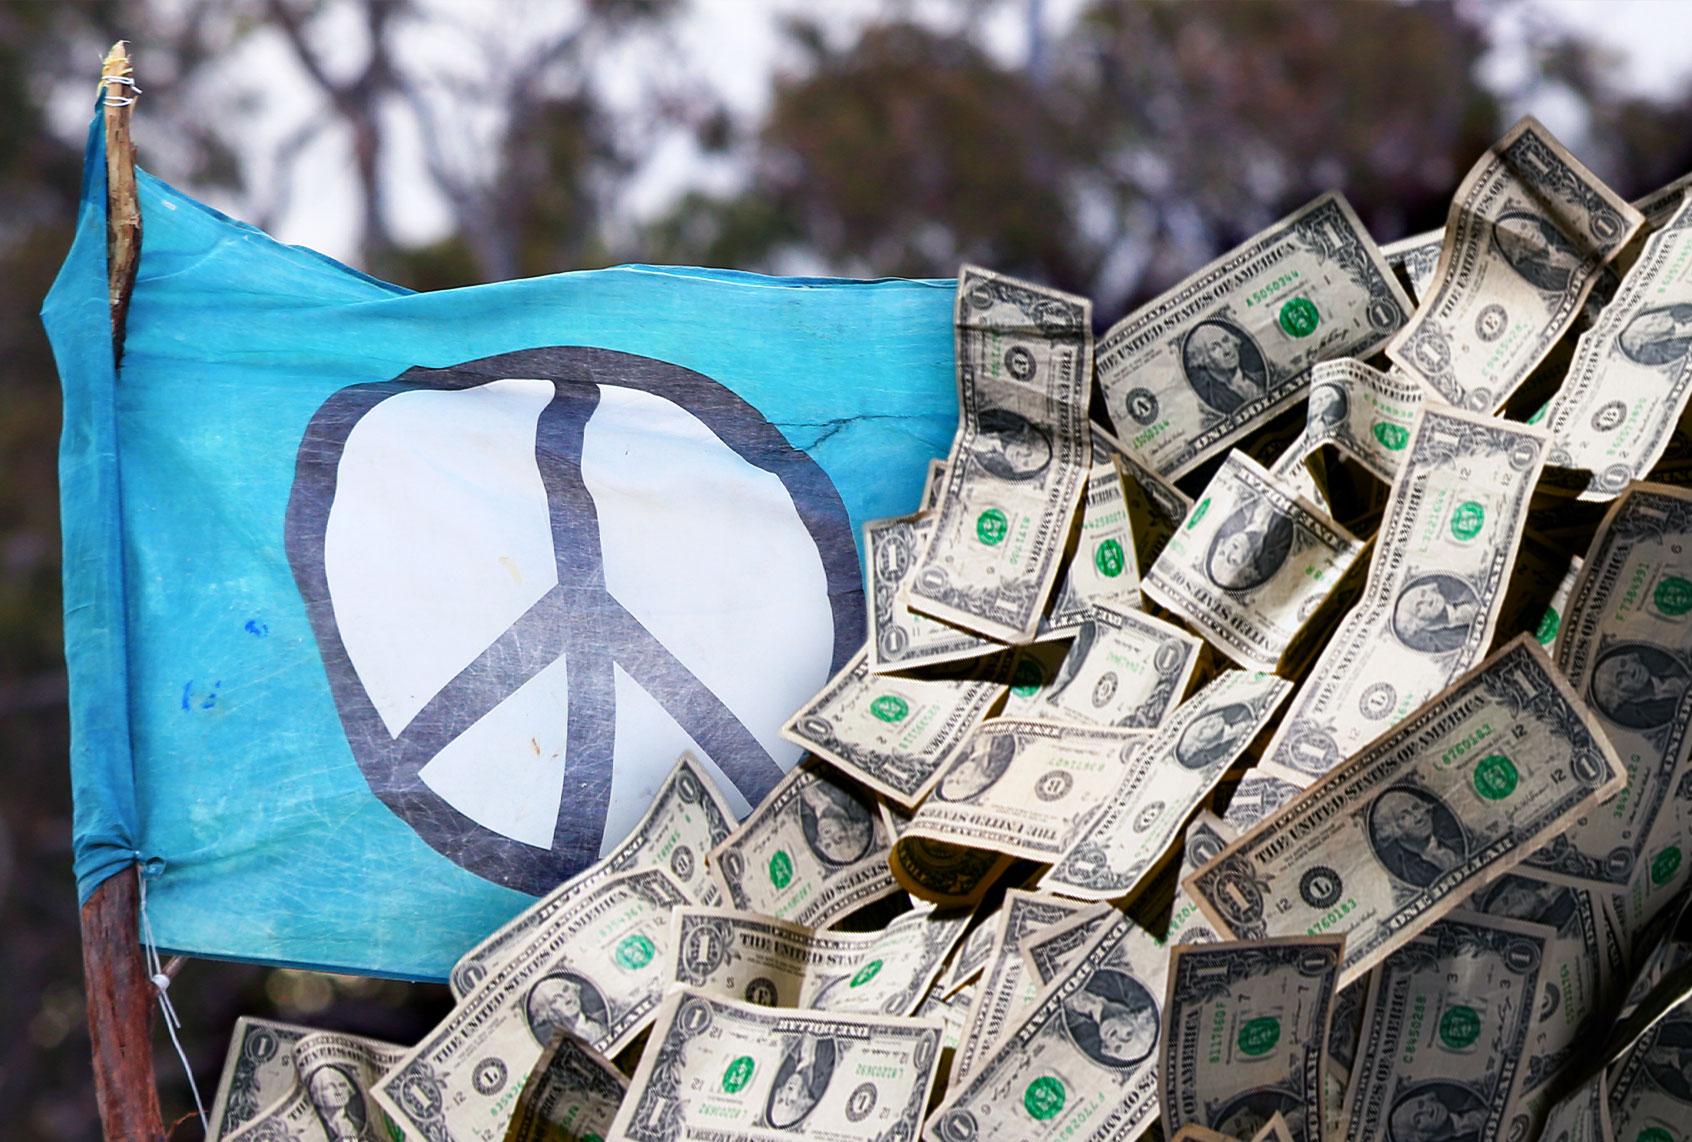 peace-money-0601211.jpg